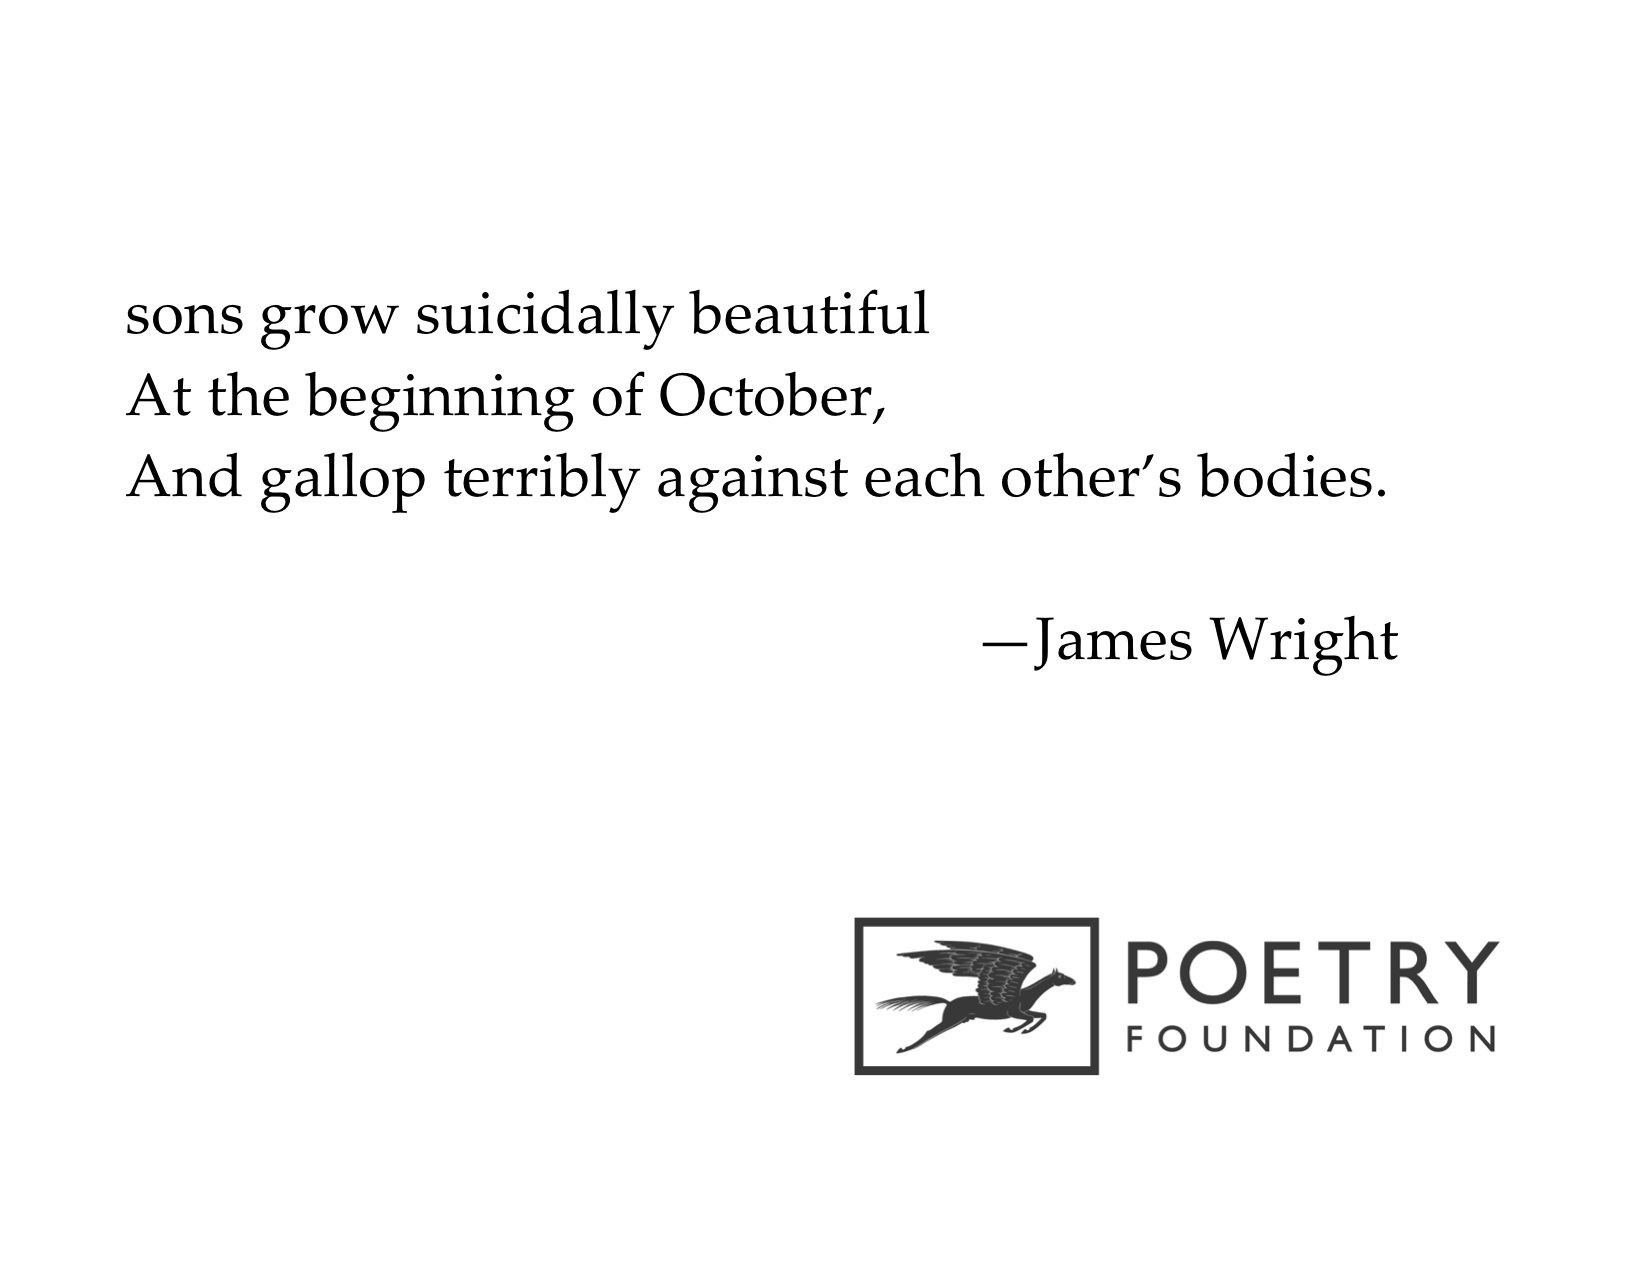 james wright autumn begins